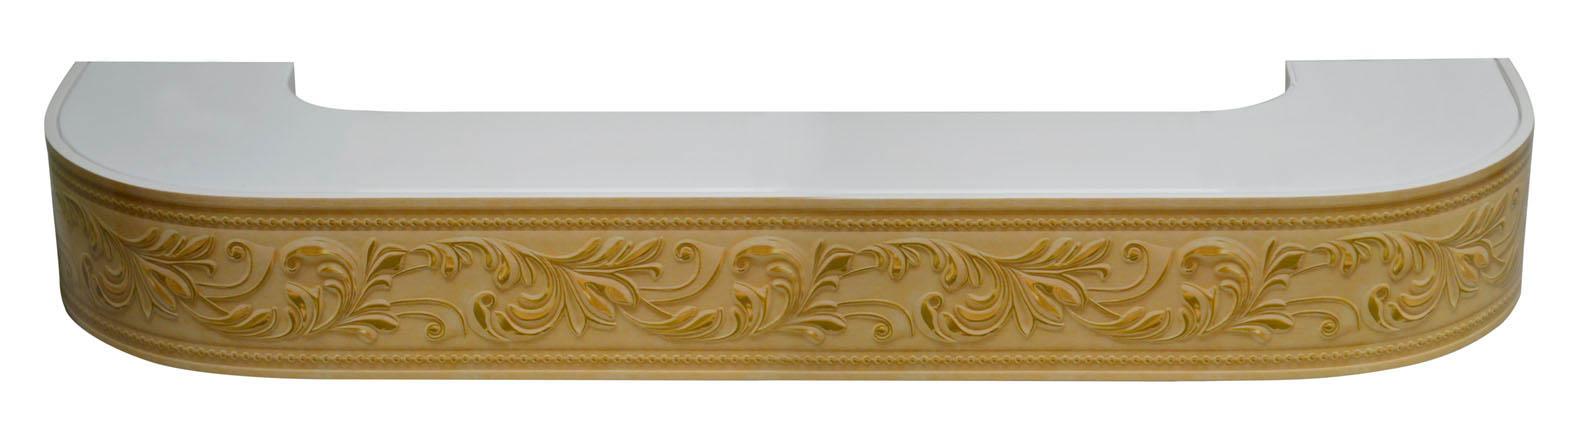 Карнизы и аксессуары для штор ARCODORO Карниз Овация Цвет: Бук (400 см)